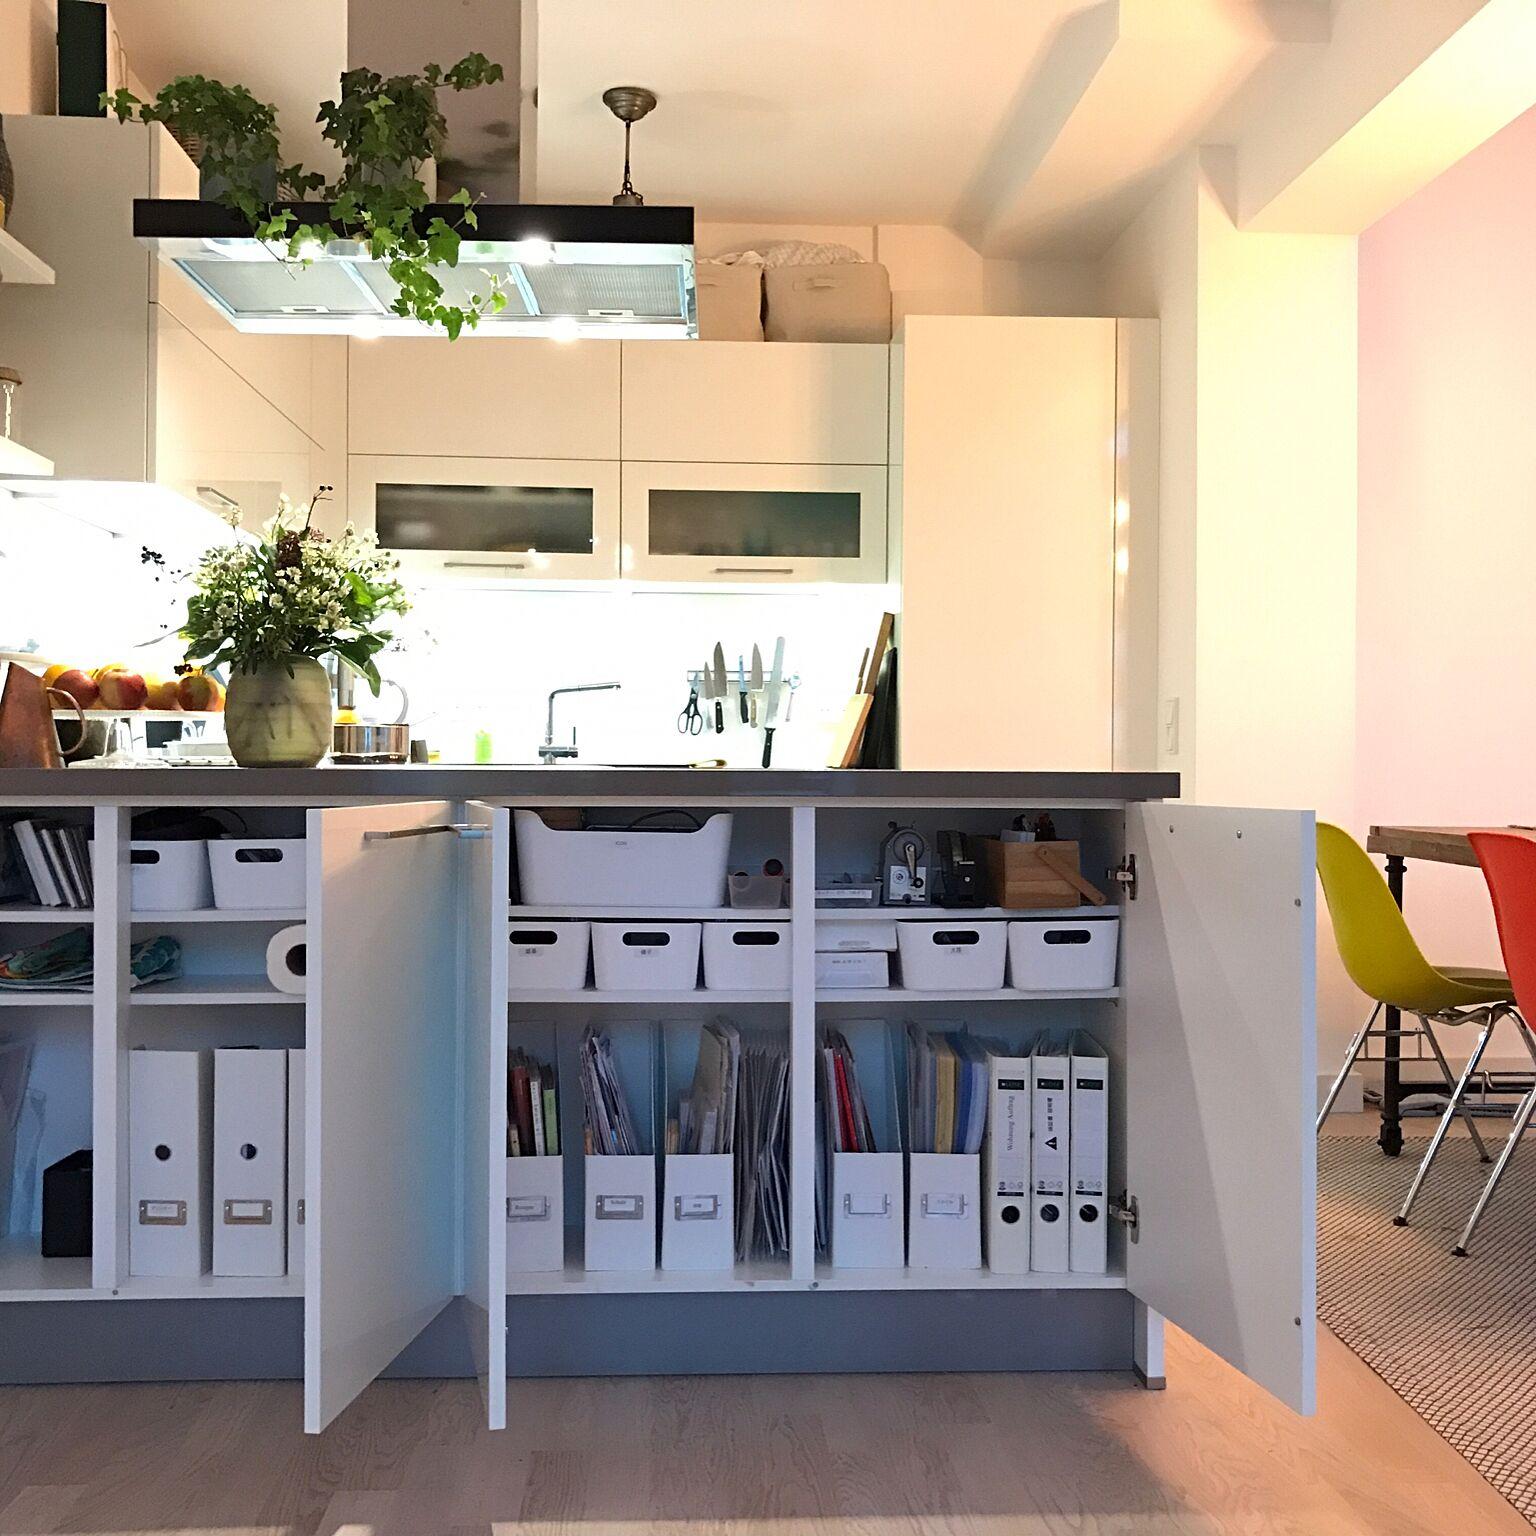 Kitchen Impossible 31 07: 観葉植物/キッチンカウンター…などのインテリア実例 - 2016-11-07 17:18:31